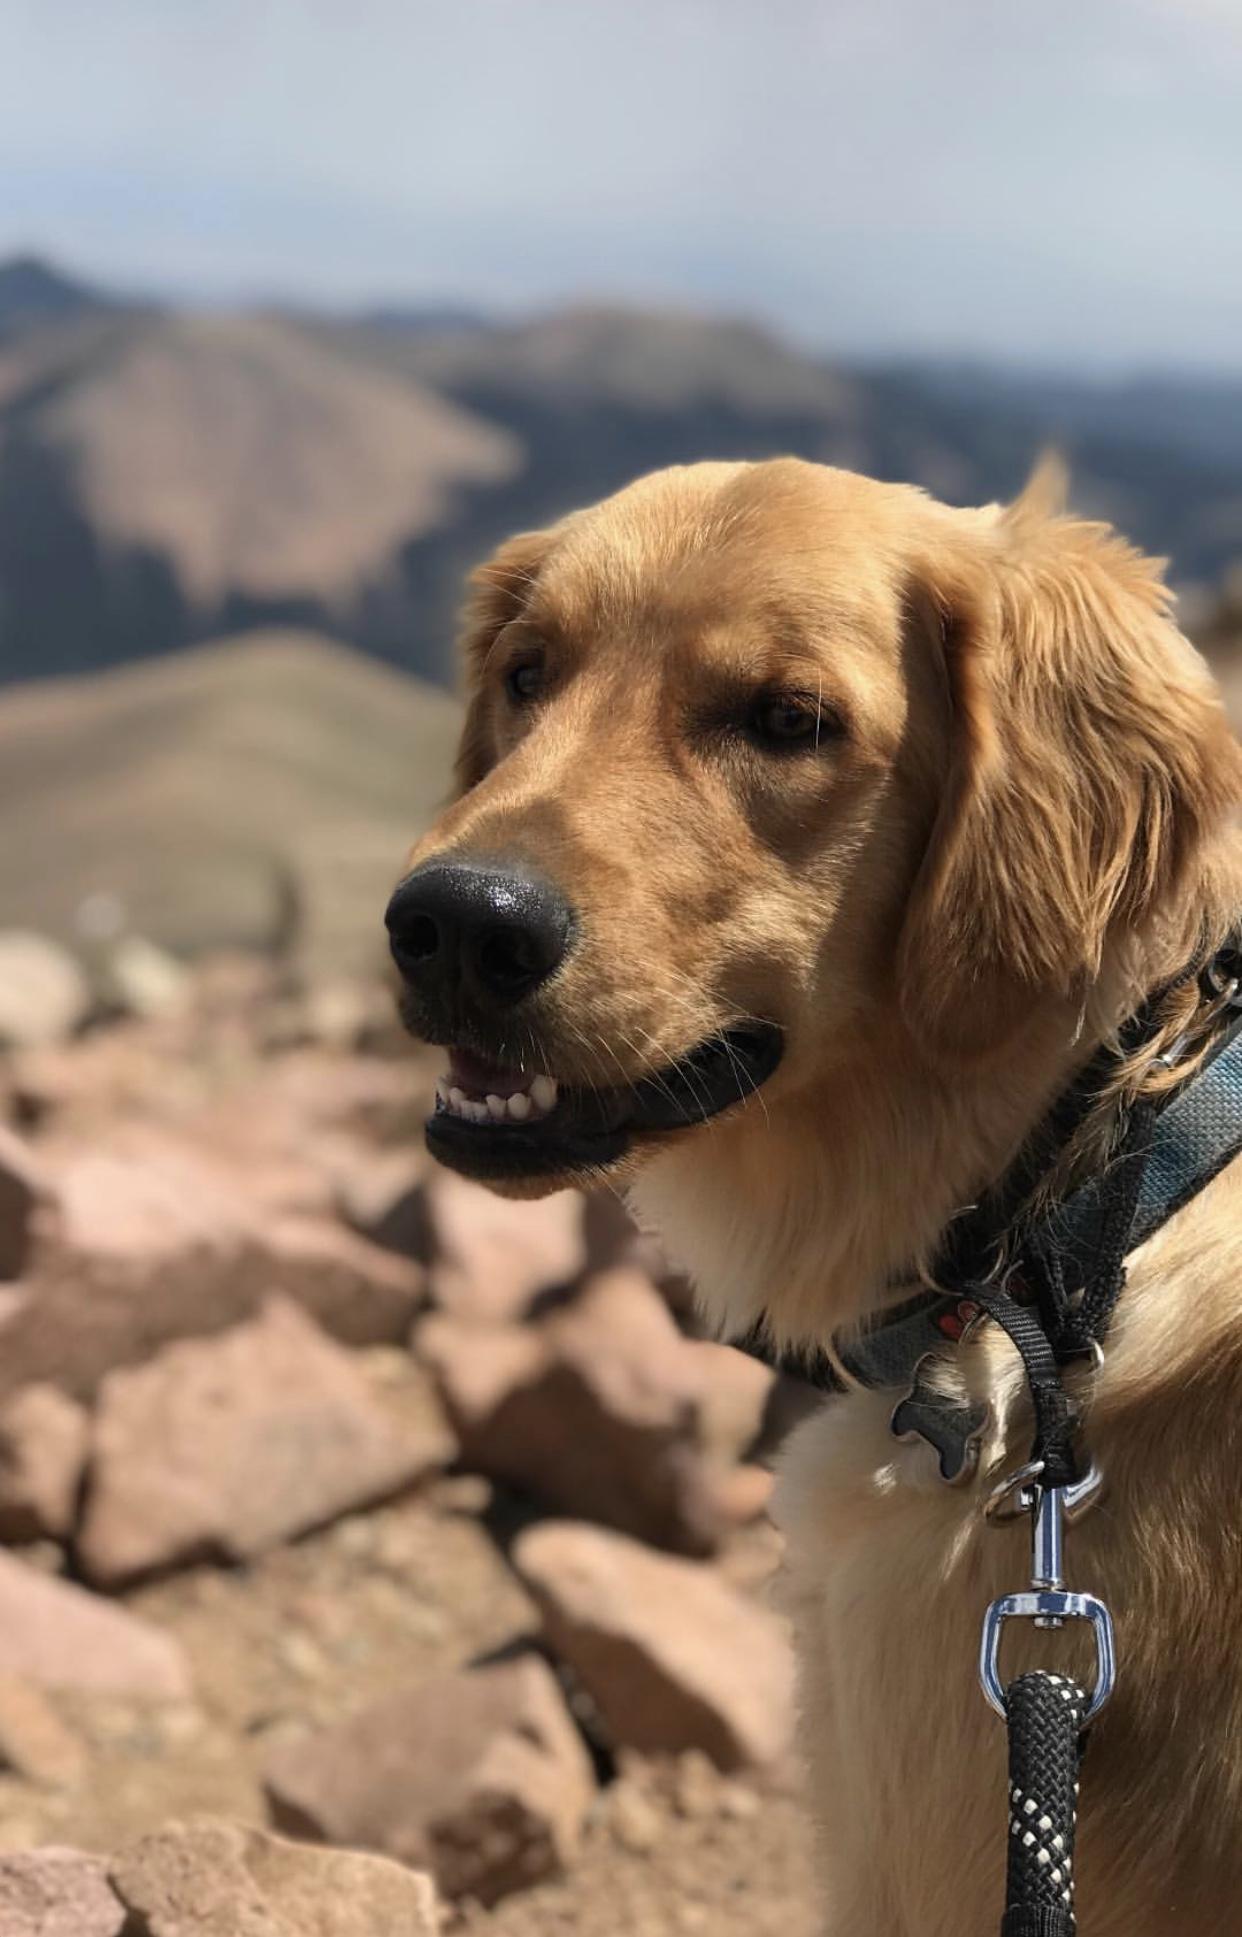 Aaa Pet Travel Photo Contest